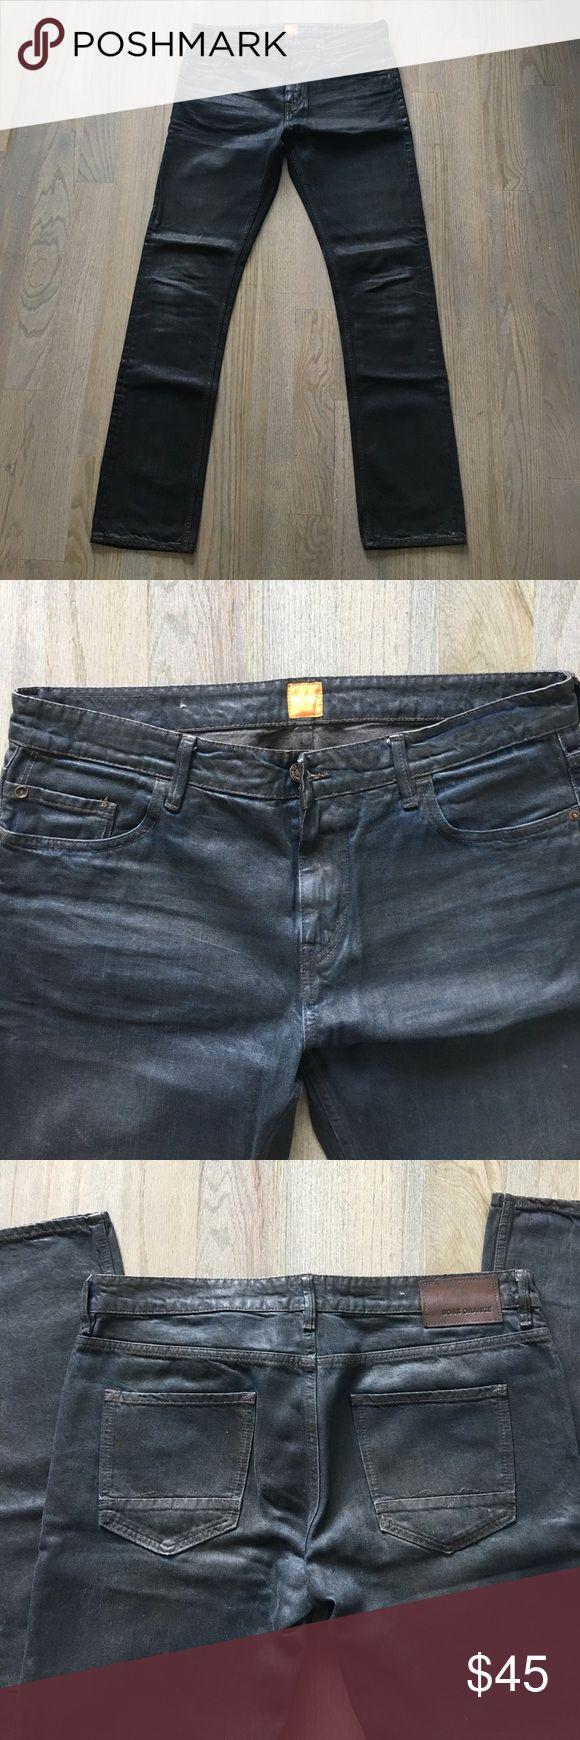 Men's Boss Orange Jeans Dark Brown Straight Leg Hugo Boss Orange Jeans. Special Treatment Finish. Worn a few times, like new. BOSS ORANGE Jeans Slim Straight